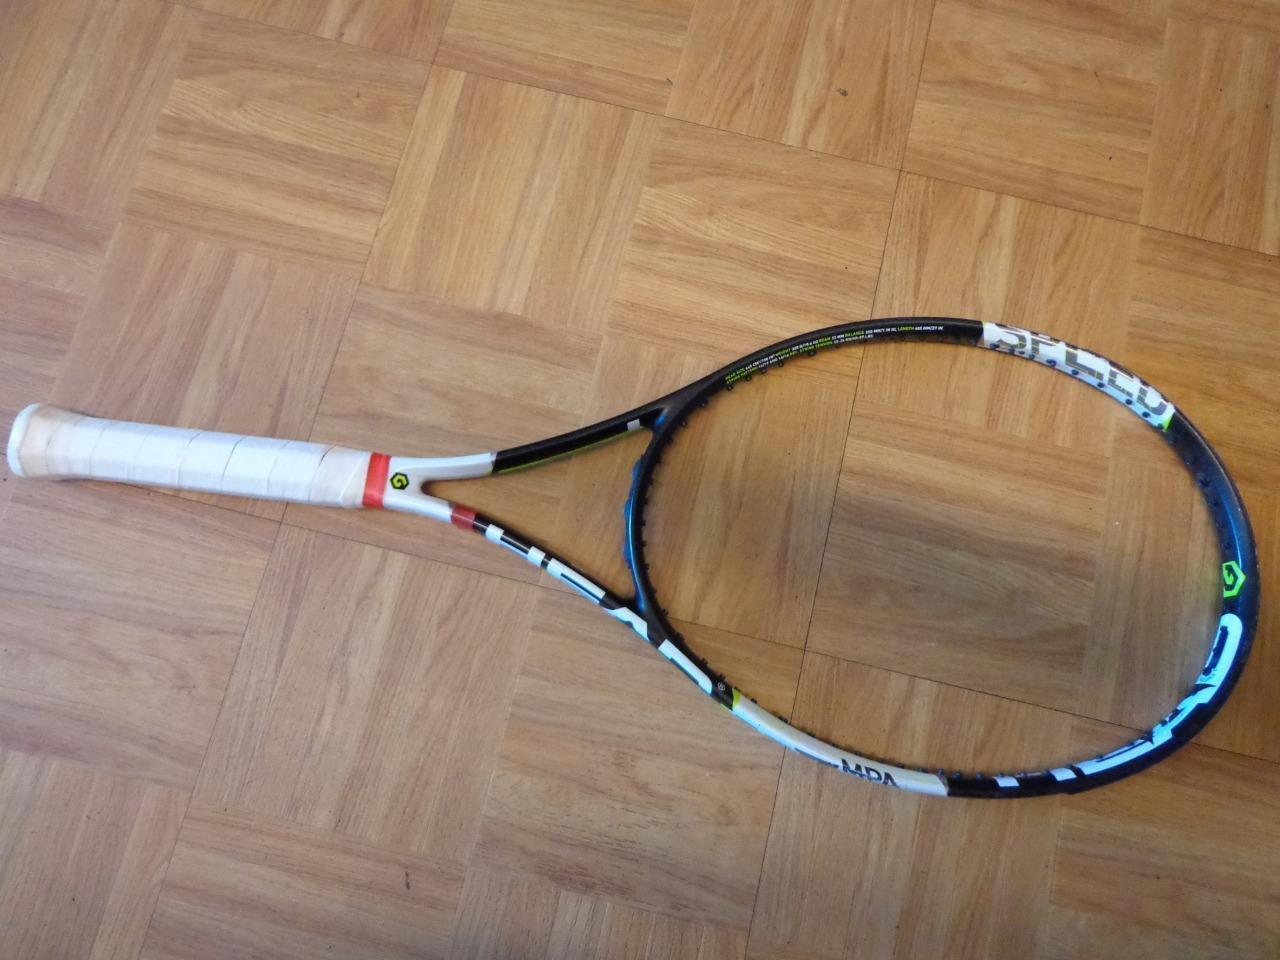 Head Graphene Xt Velocidad Mp 100 cabeza 10.6oz 4 3 8 Grip Tenis Raqueta